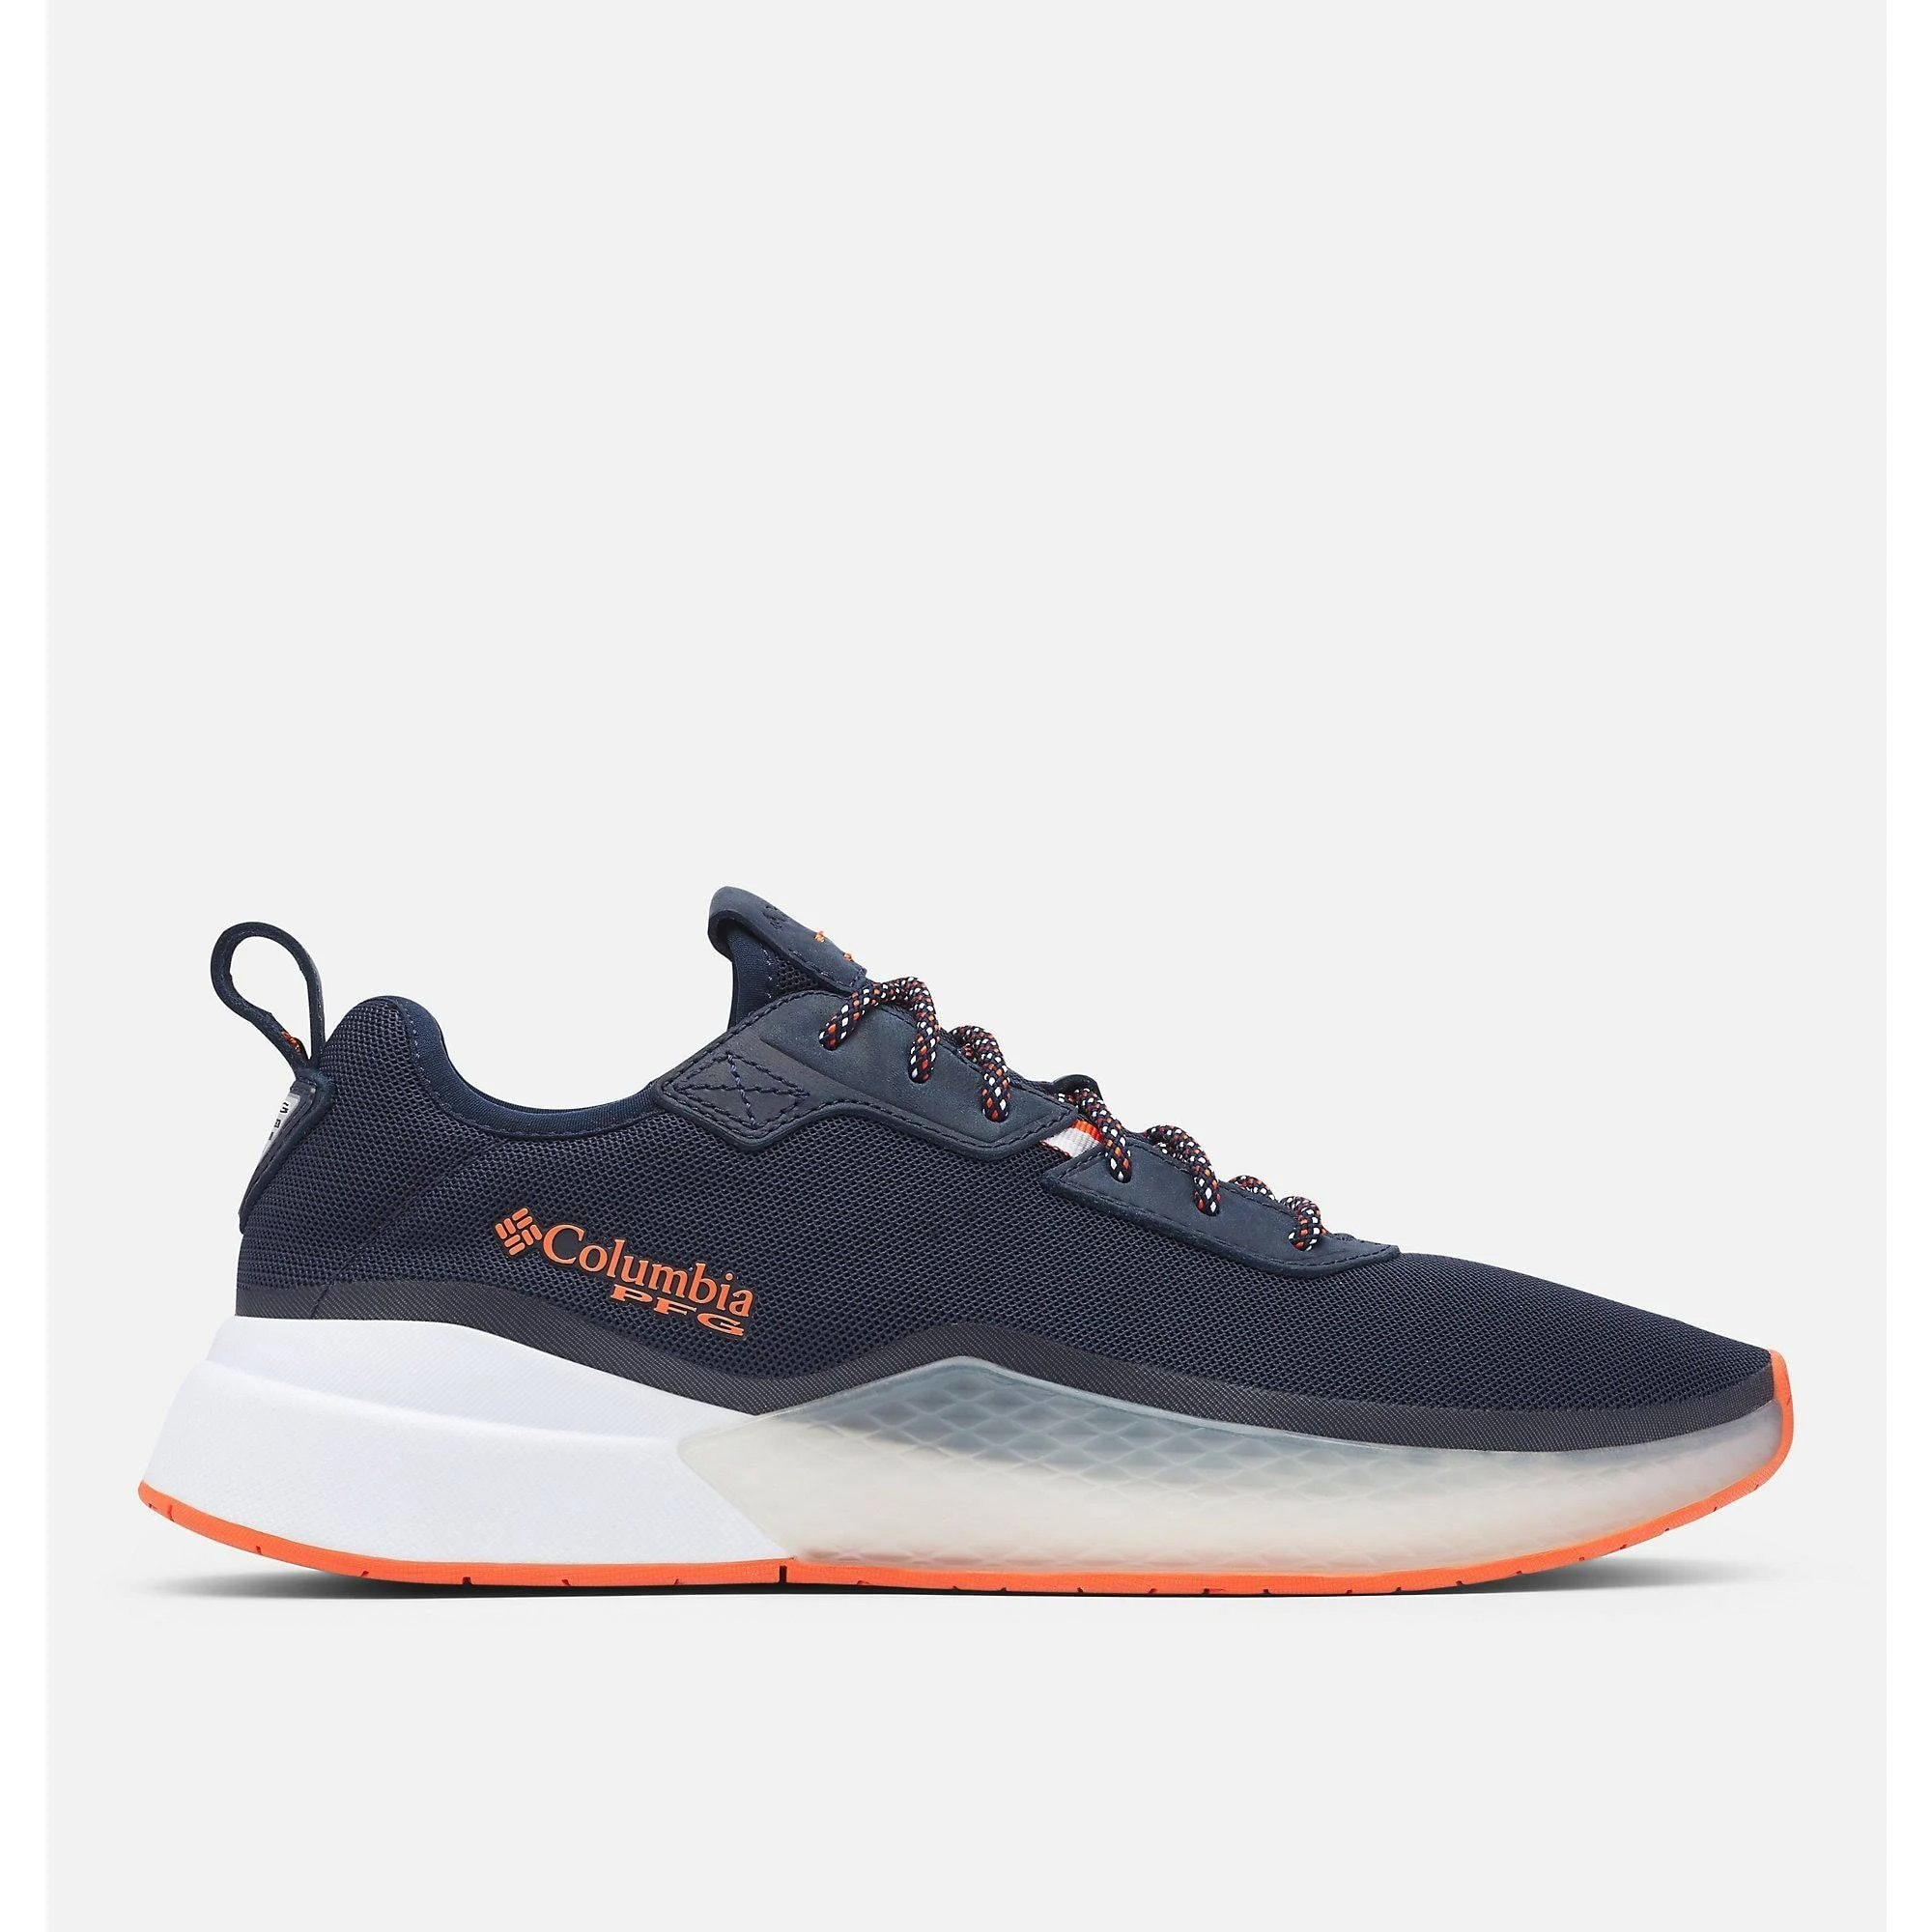 Columbia PFG Fishing Shoes